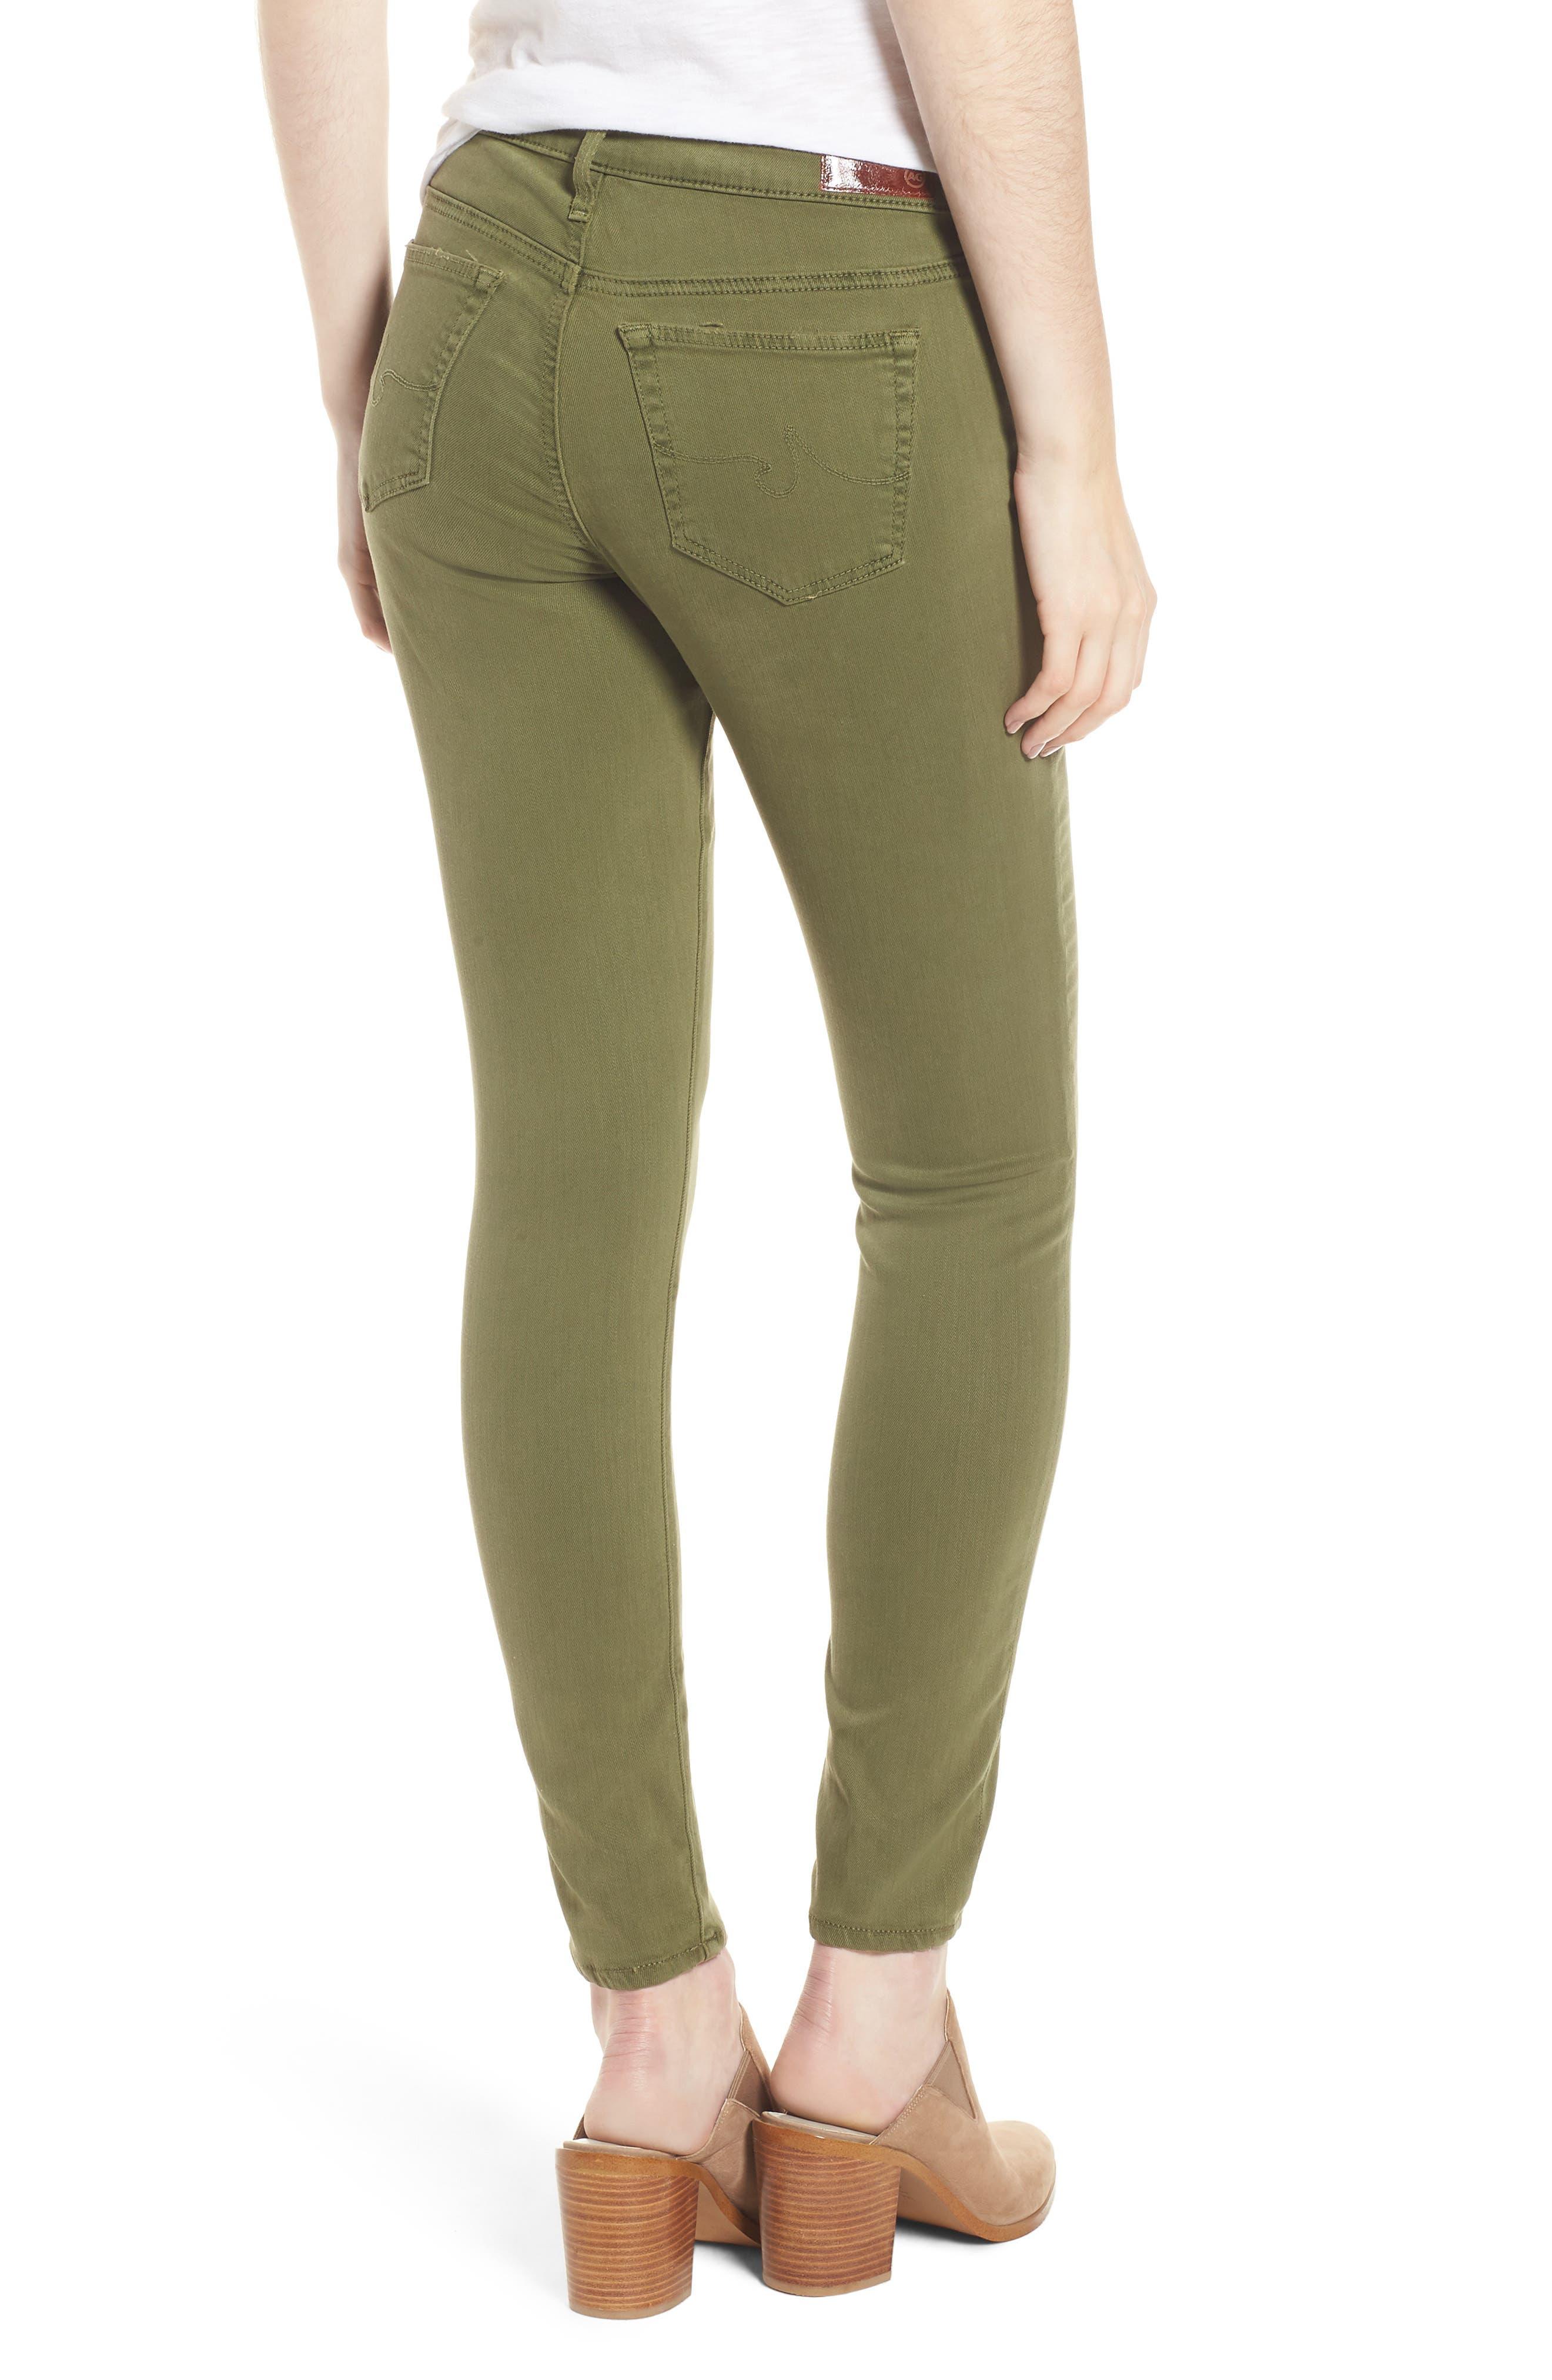 'The Legging' Ankle Jeans,                             Alternate thumbnail 2, color,                             SULFUR OLIVE GROVE